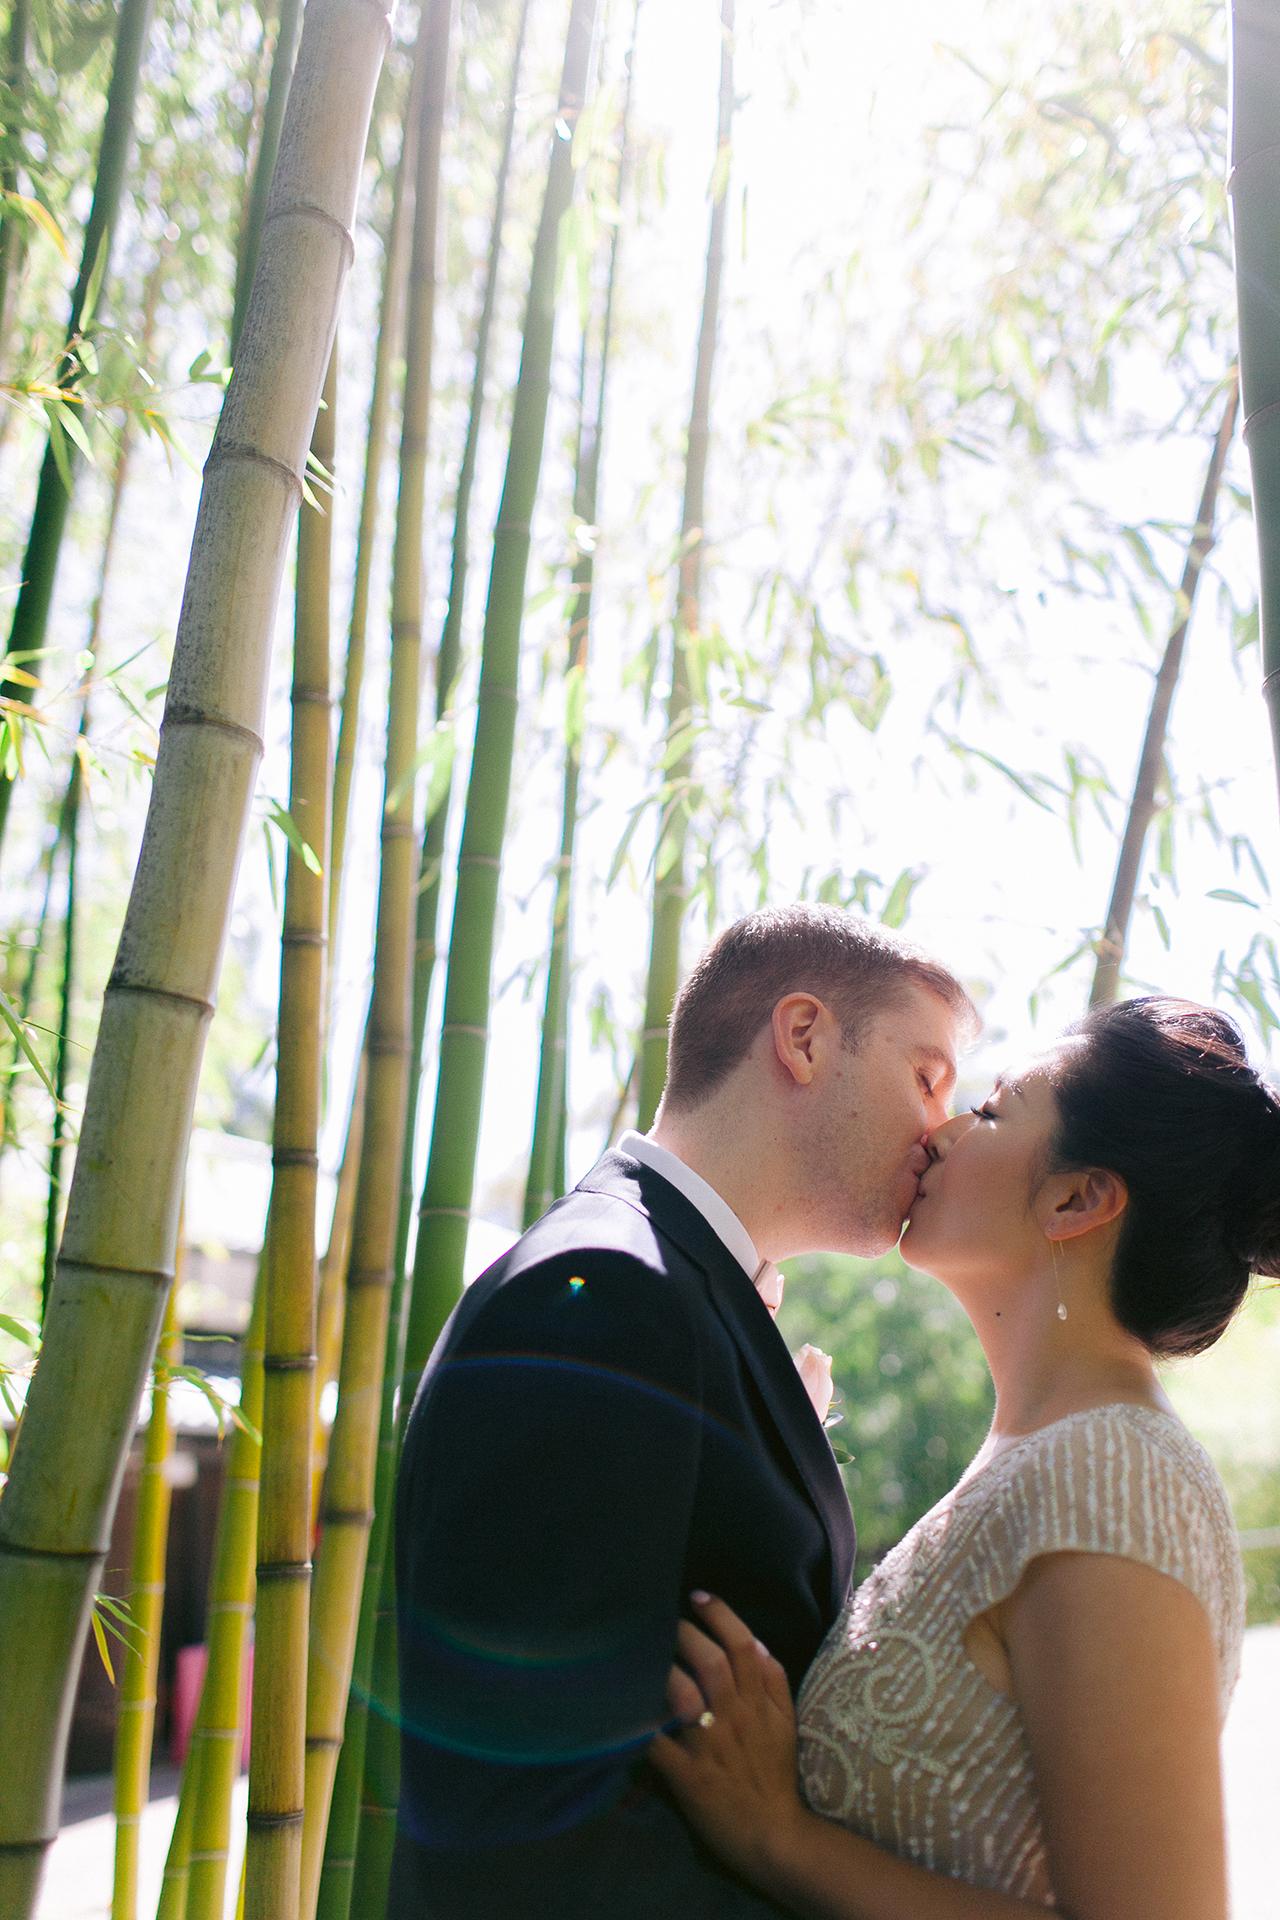 Hakone_Estate_and_Gardens_Wedding_014.jpg